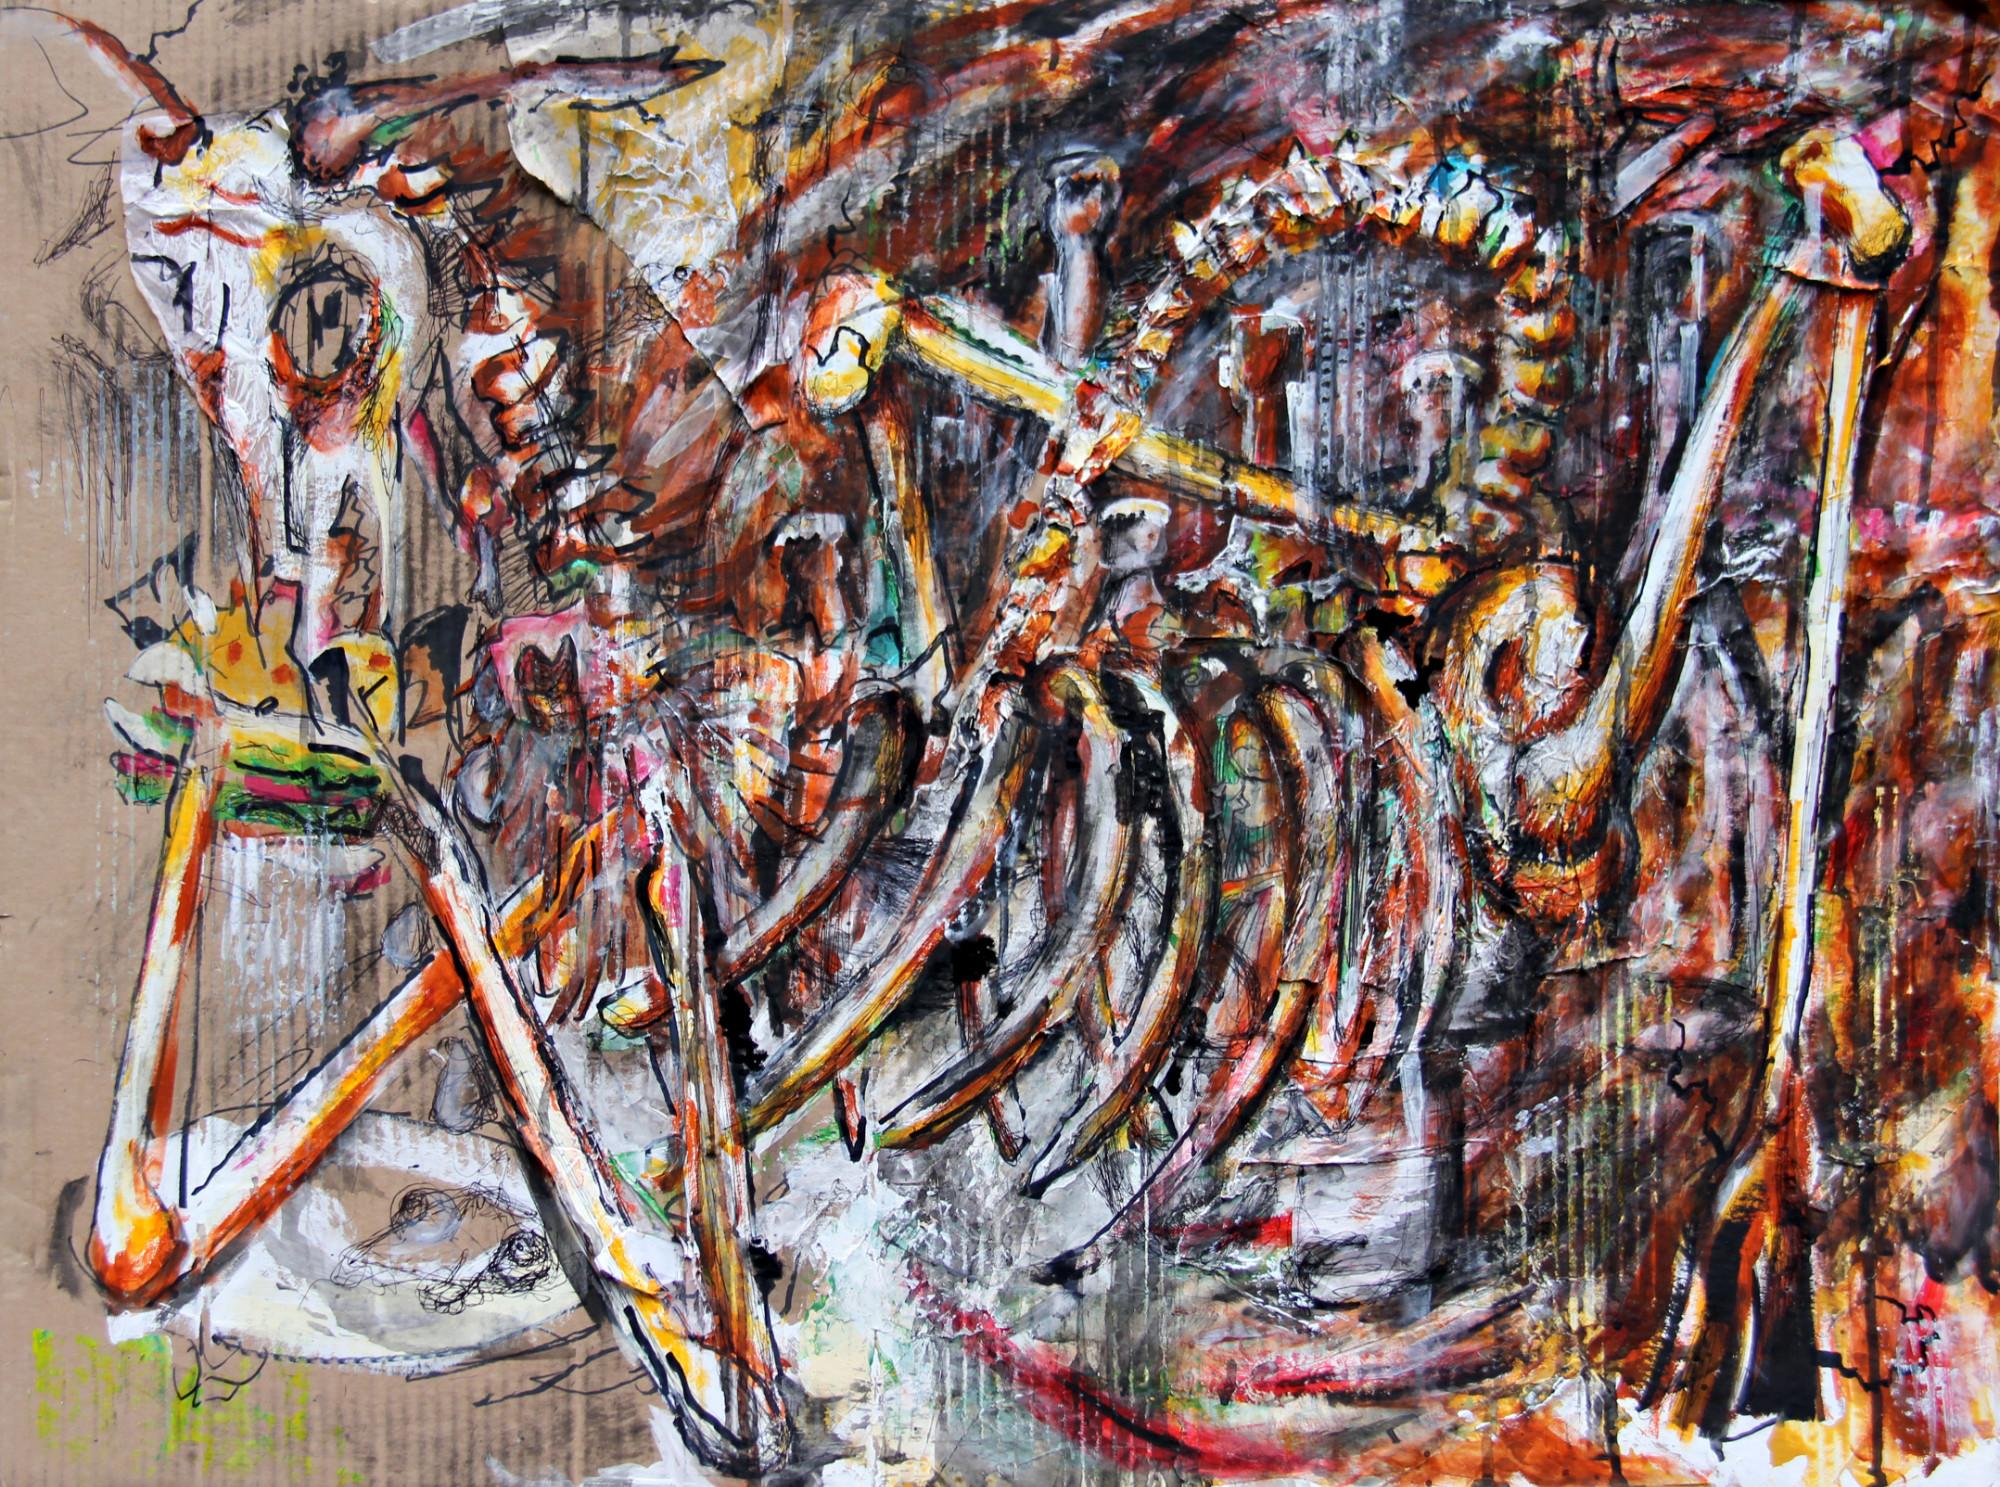 Hamburger der Apokalypse, 80x60cm, Marc Allgaier, 2013